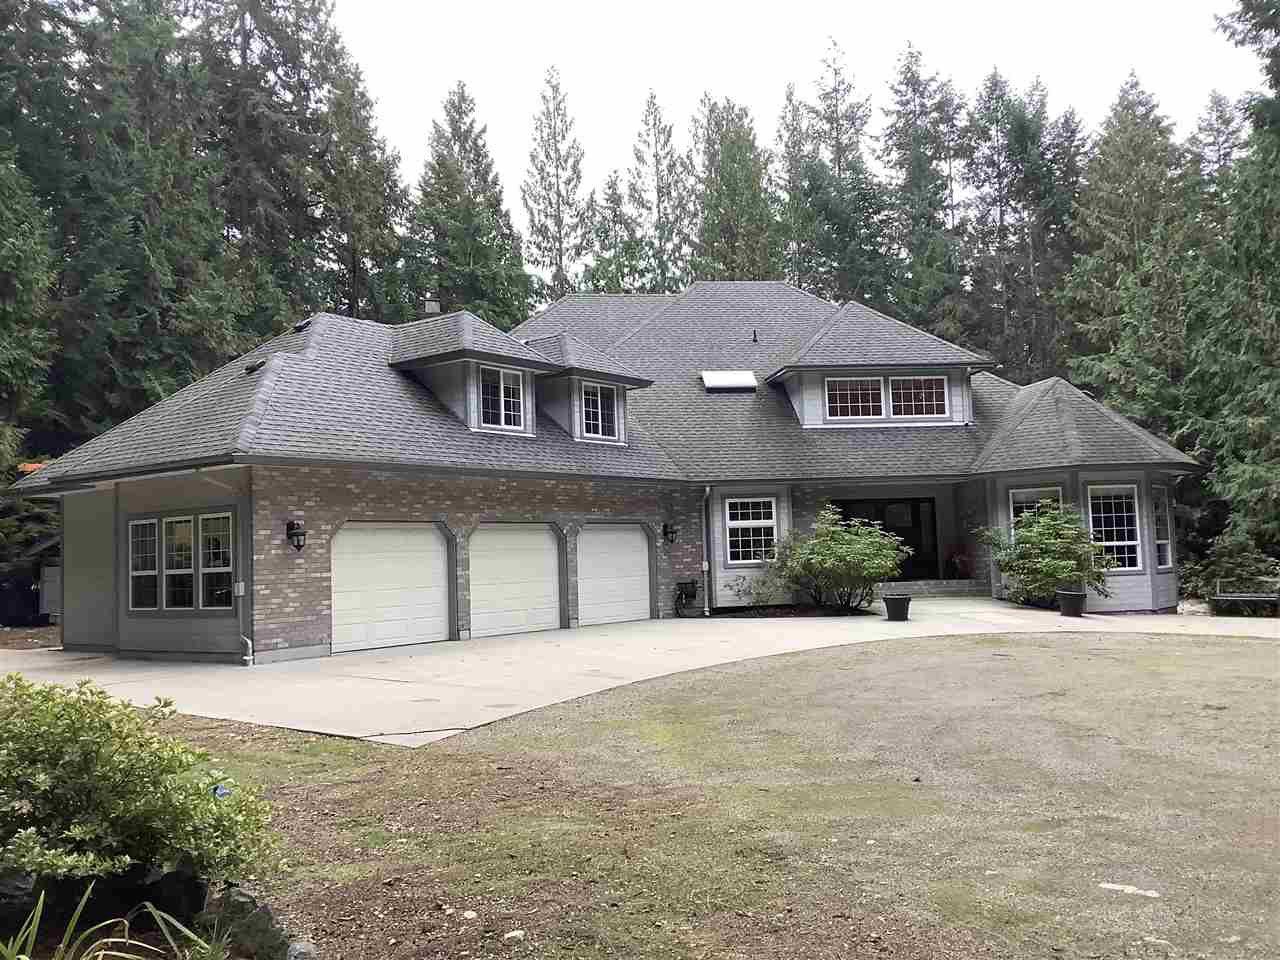 Main Photo: 1356 ROBERTS CREEK Road: Roberts Creek House for sale (Sunshine Coast)  : MLS®# R2512236